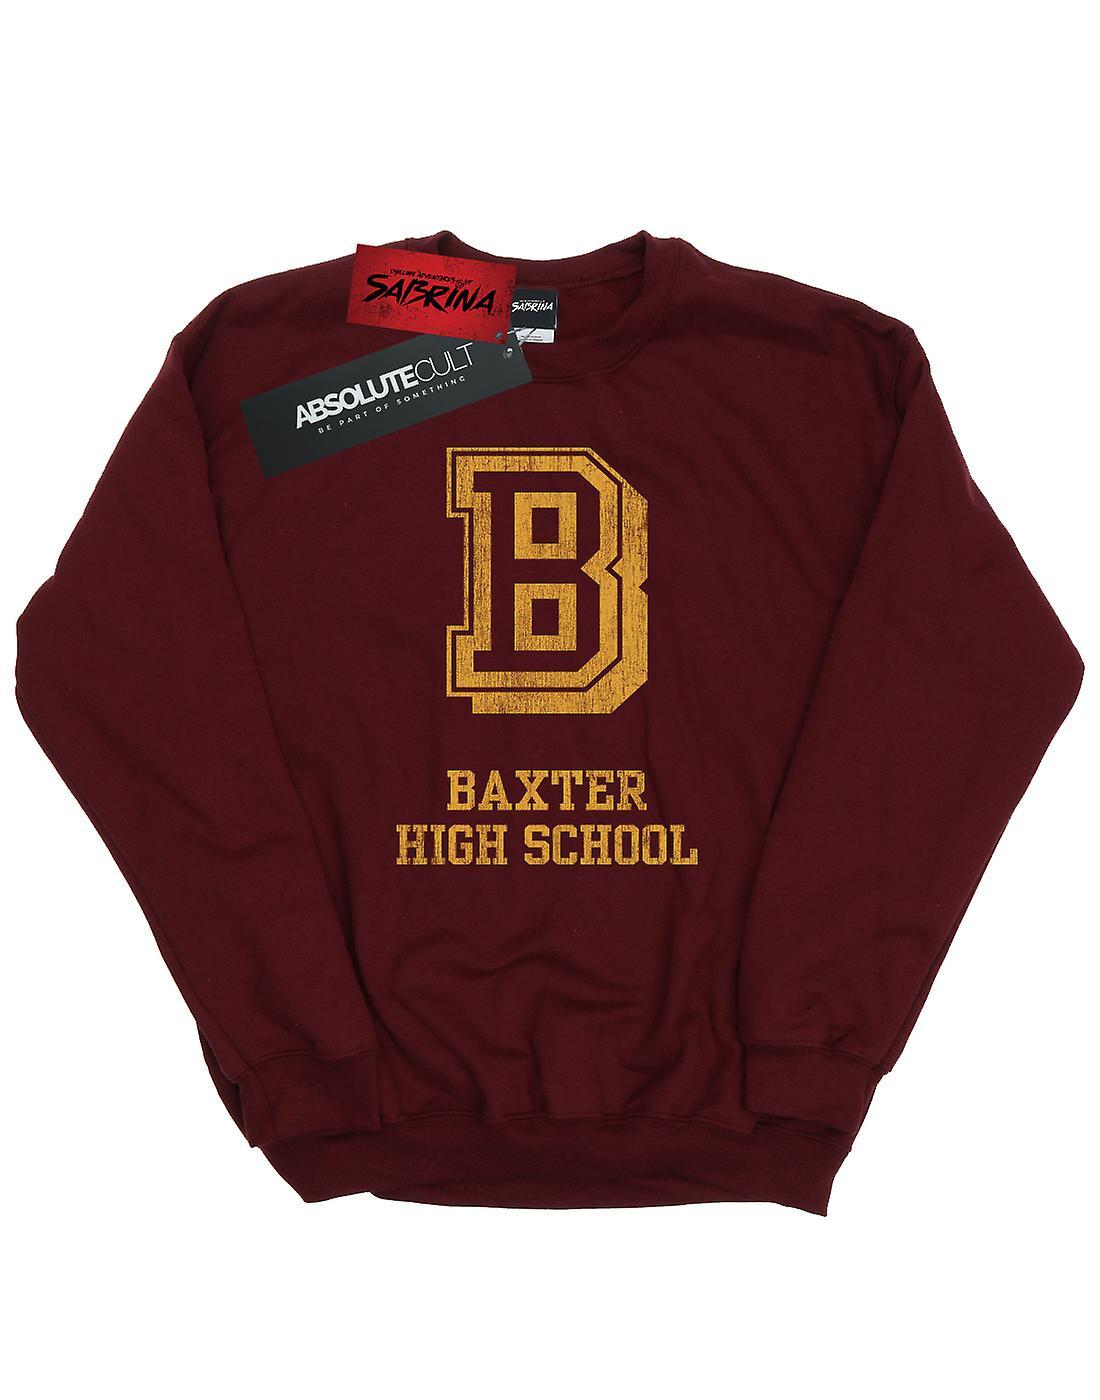 The Chilling Adventures Of Sabrina Women's Baxter High School Sweatshirt